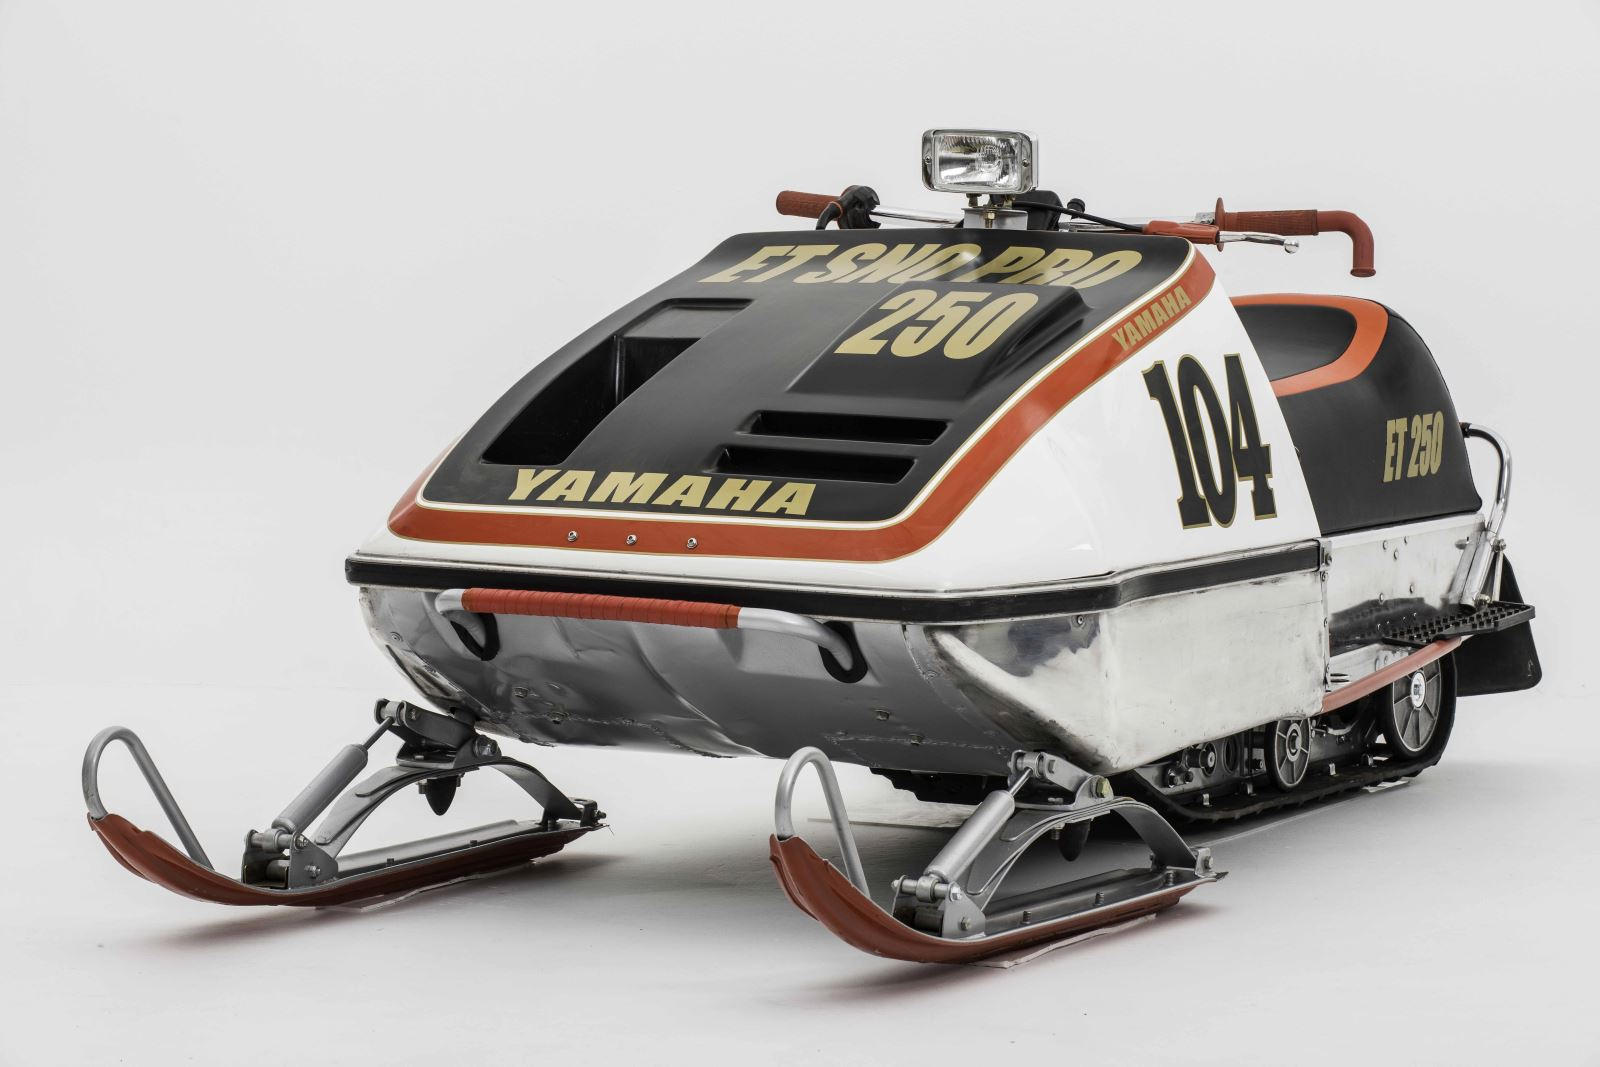 New Yamaha Et Sno Pro Hood Snowest Magazine